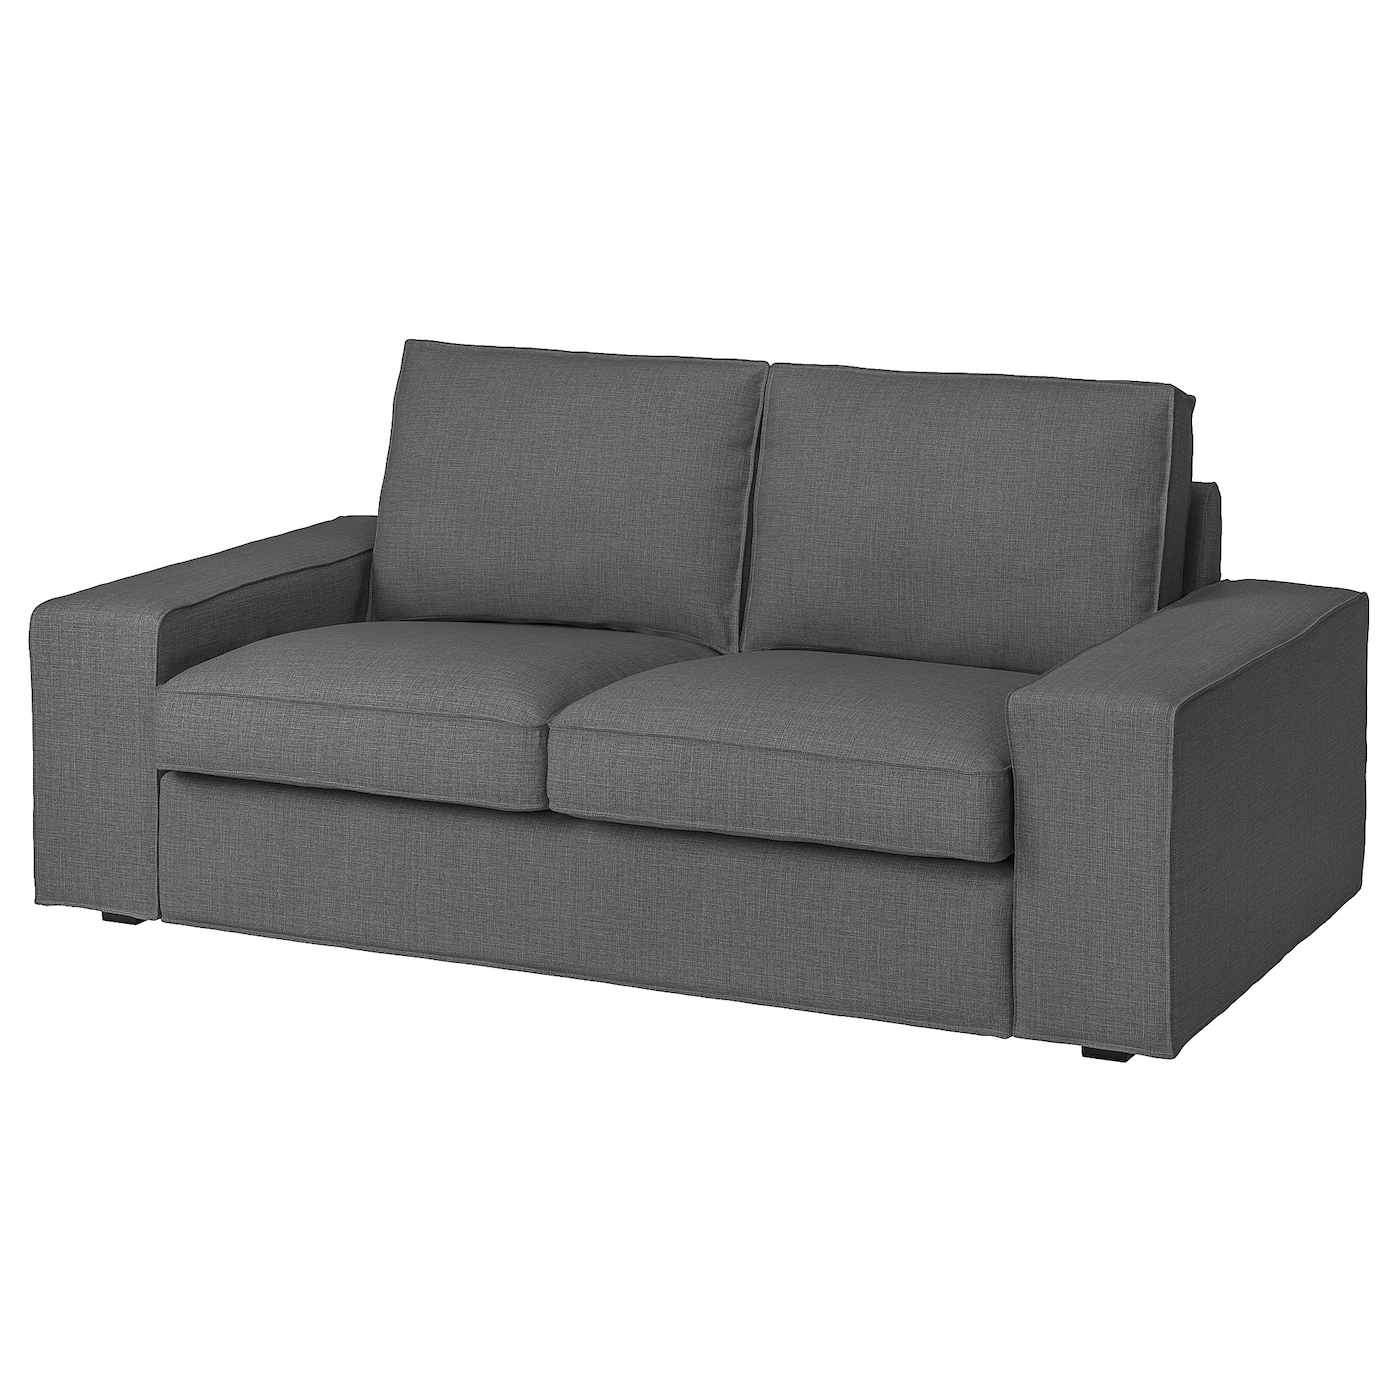 KIVIK Loveseat   Skiftebo dark gray   IKEA